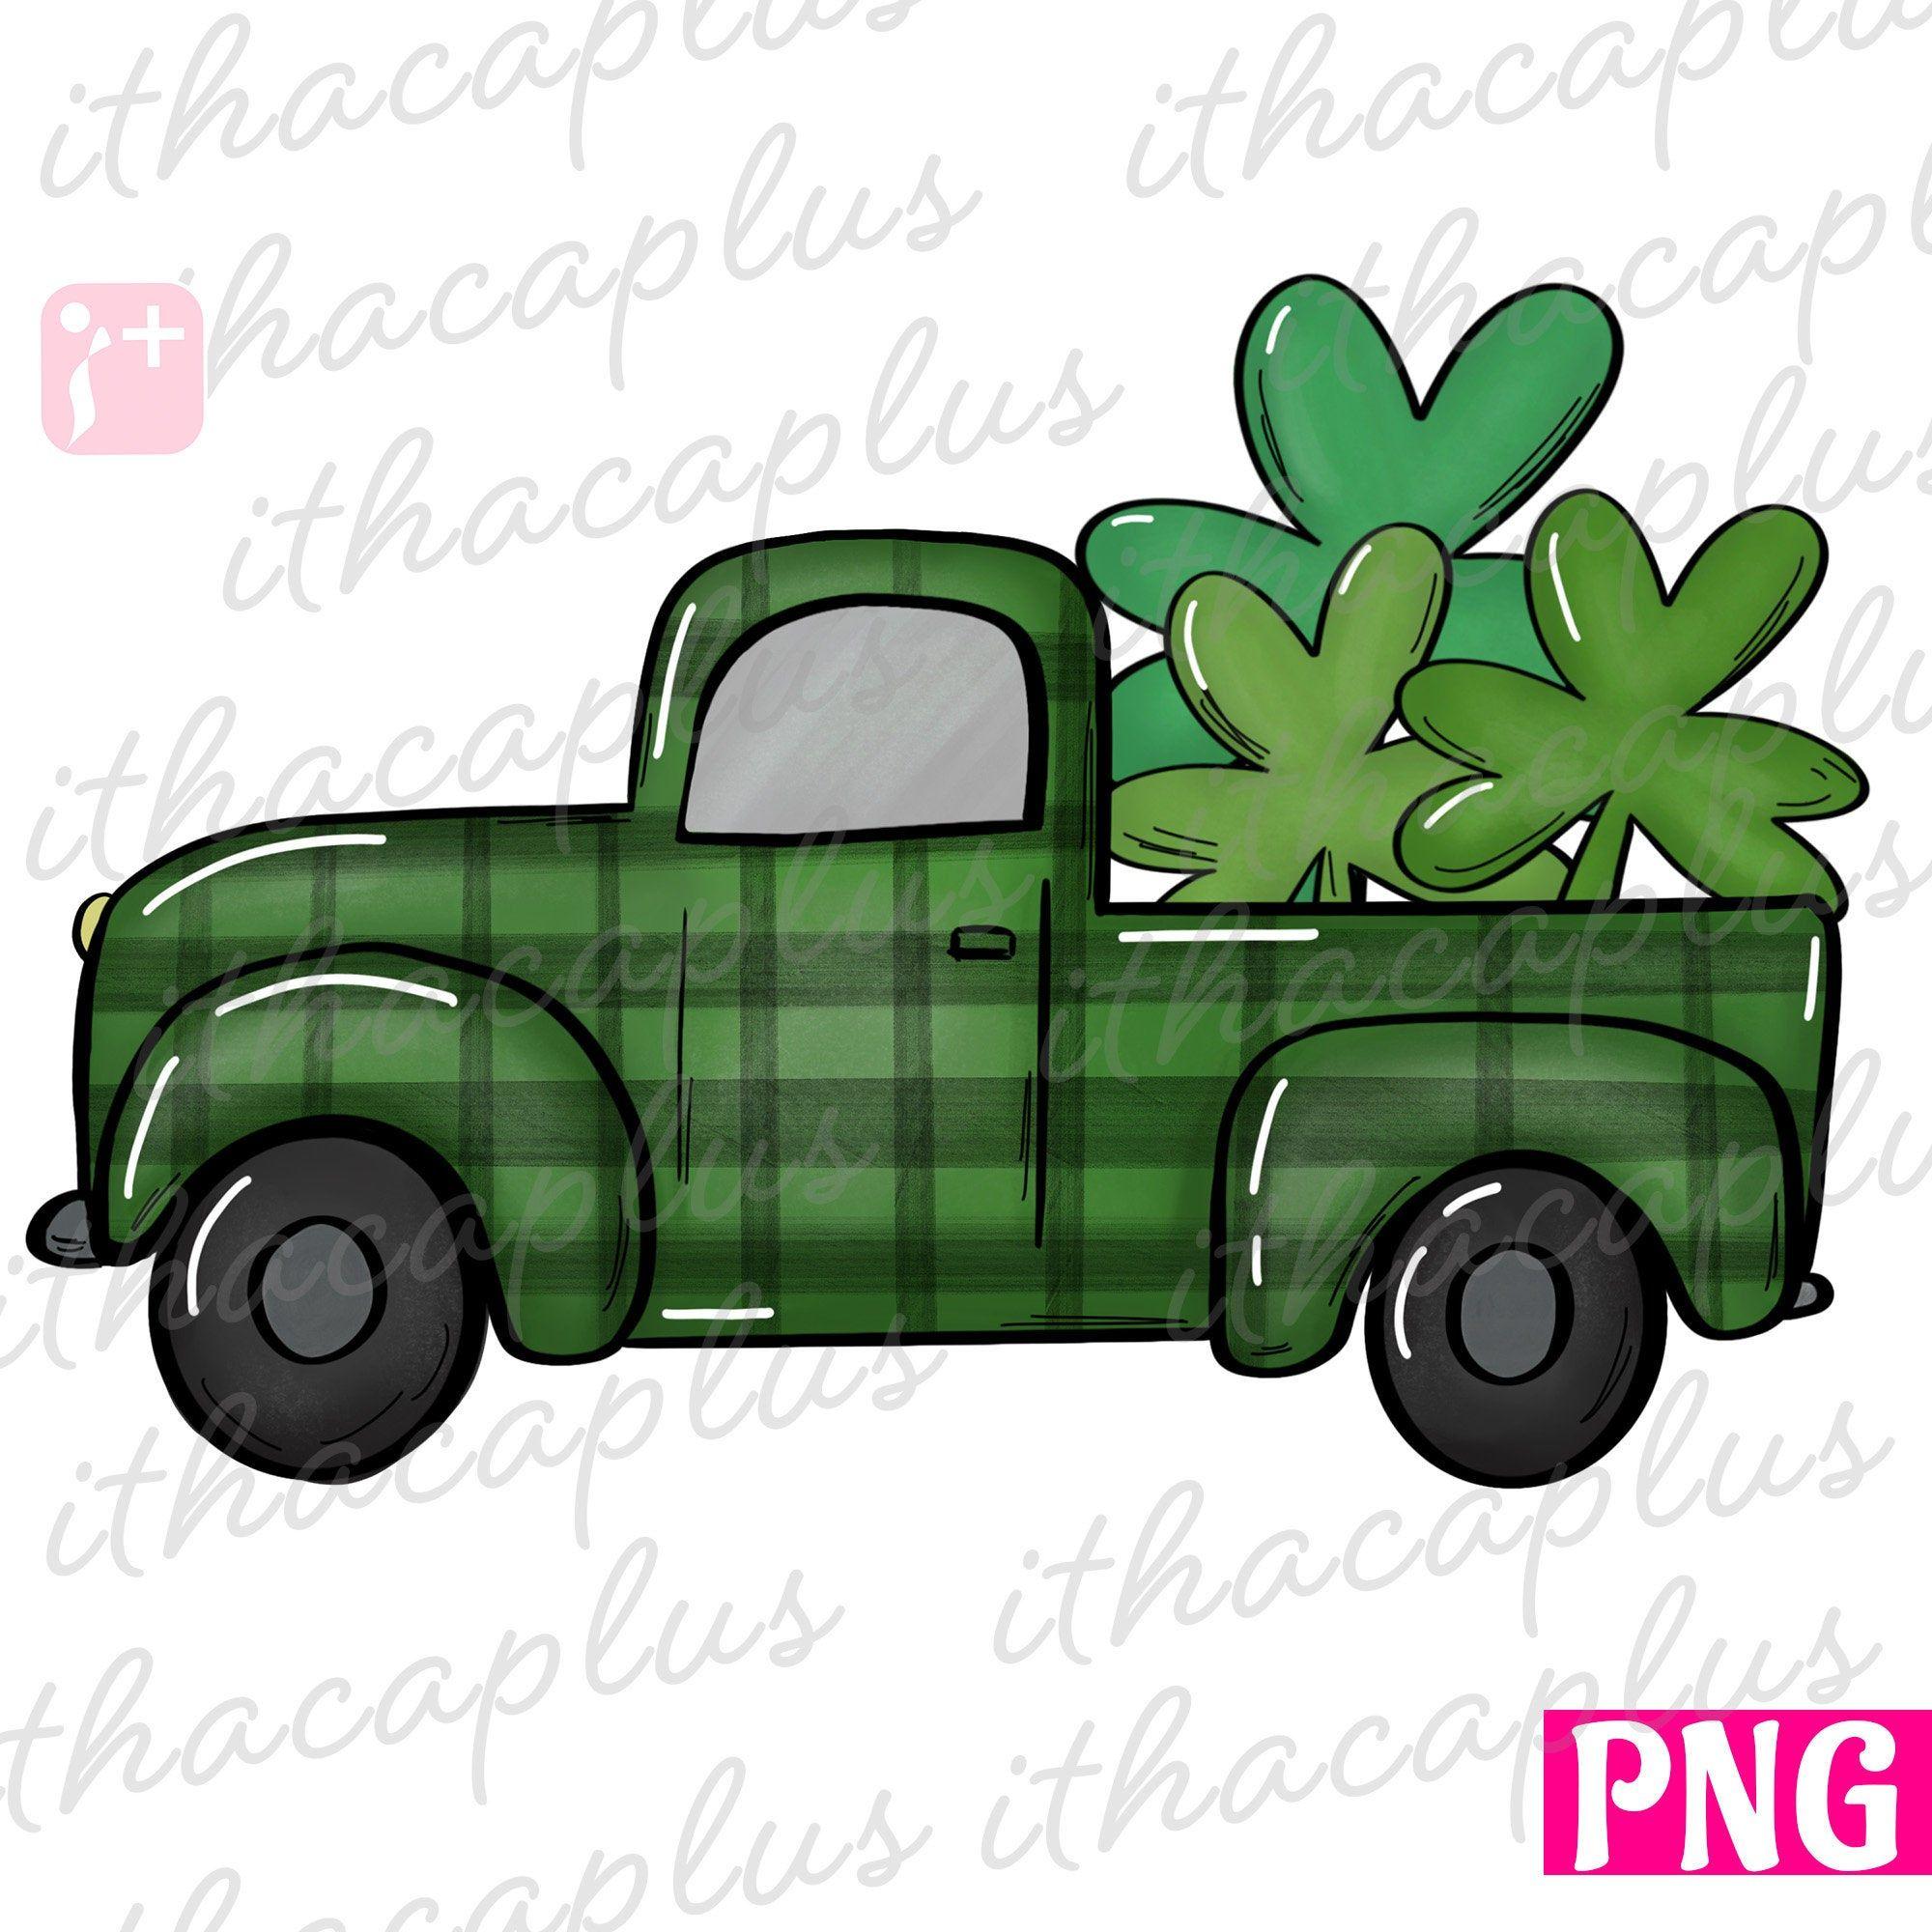 St Patrick S Day Png St Patrick S Truck Png Etsy In 2021 St Patricks Day Wallpaper St Patricks Day Cards Saint Patricks Day Art